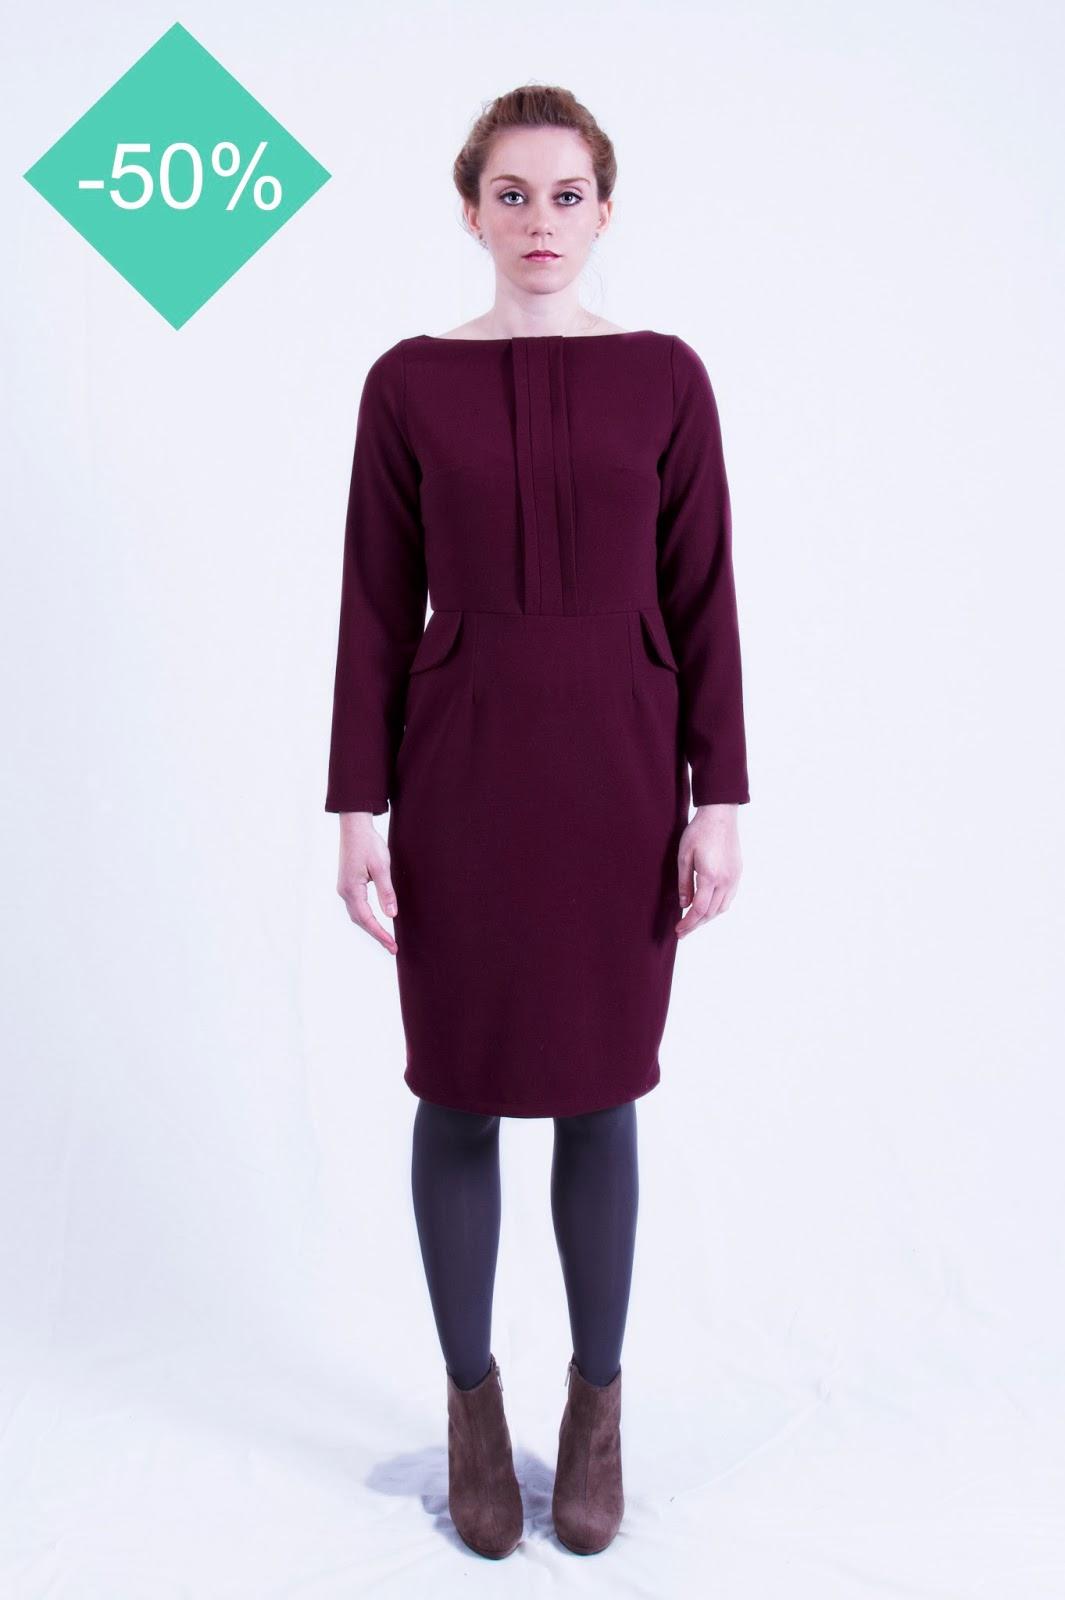 http://labocoqueshop.bigcartel.com/product/vestido-severin#.UuqykPuIrA4